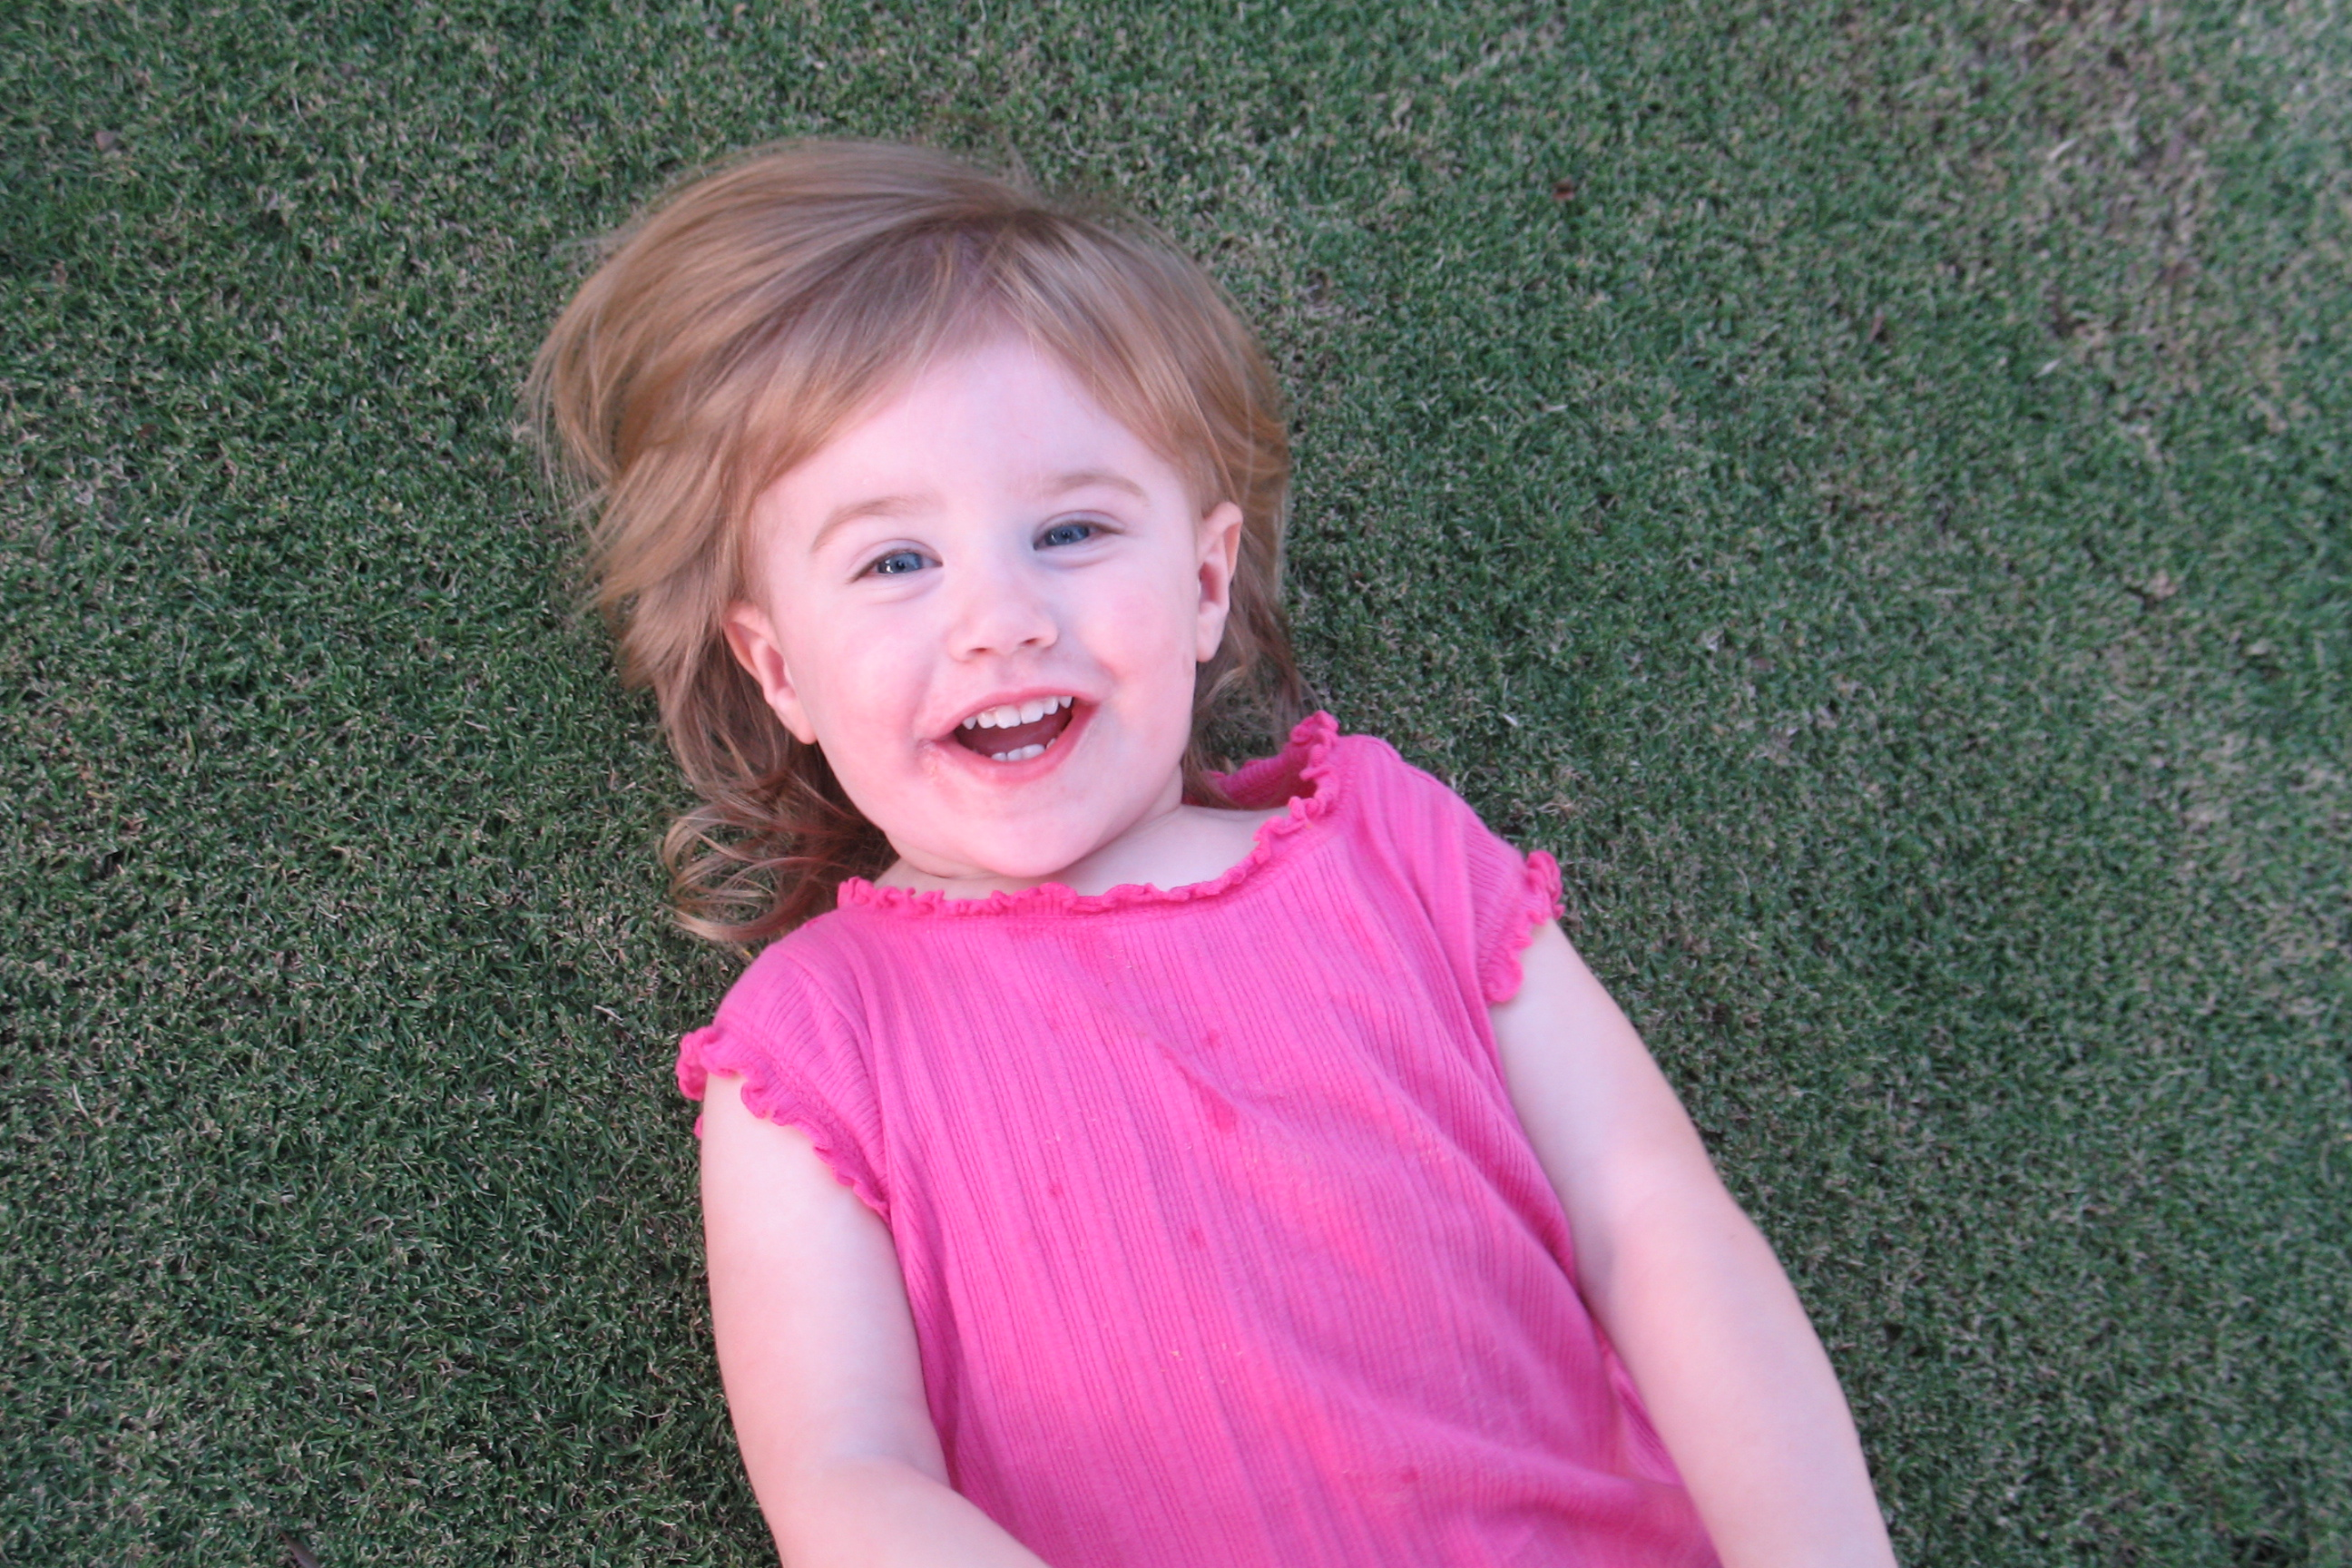 Girl in pink, Bspo7, Child, Dress, Fun, HQ Photo